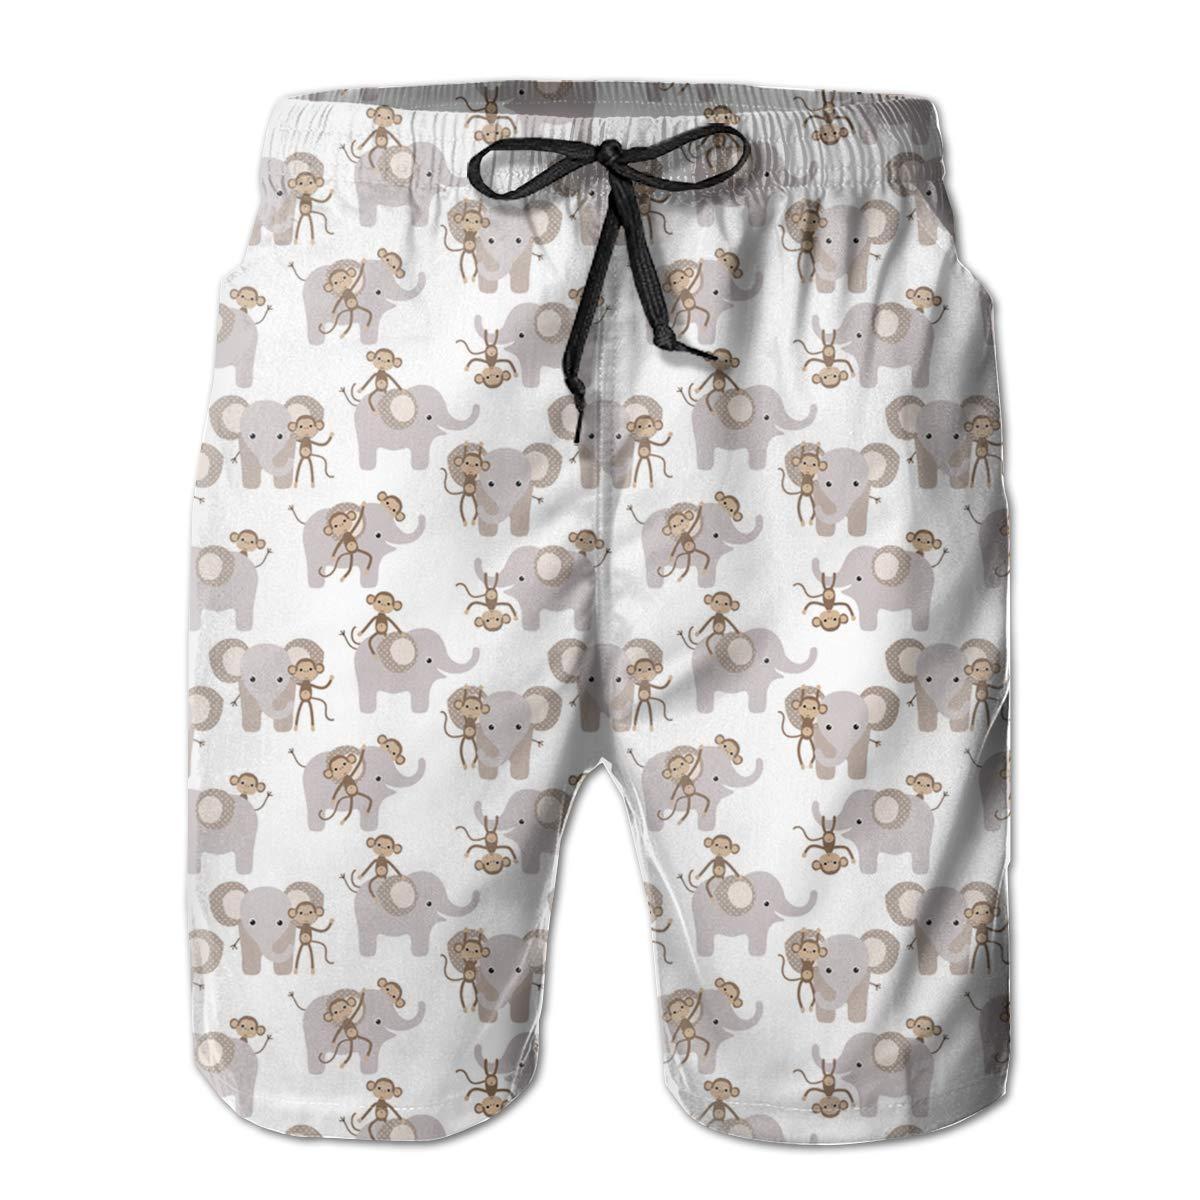 VIRTUALSHELF Mens Swim Trunks Monkey Elephant Pink Quick Dry Drawstring Surfing Beach Board Shorts with Pockets